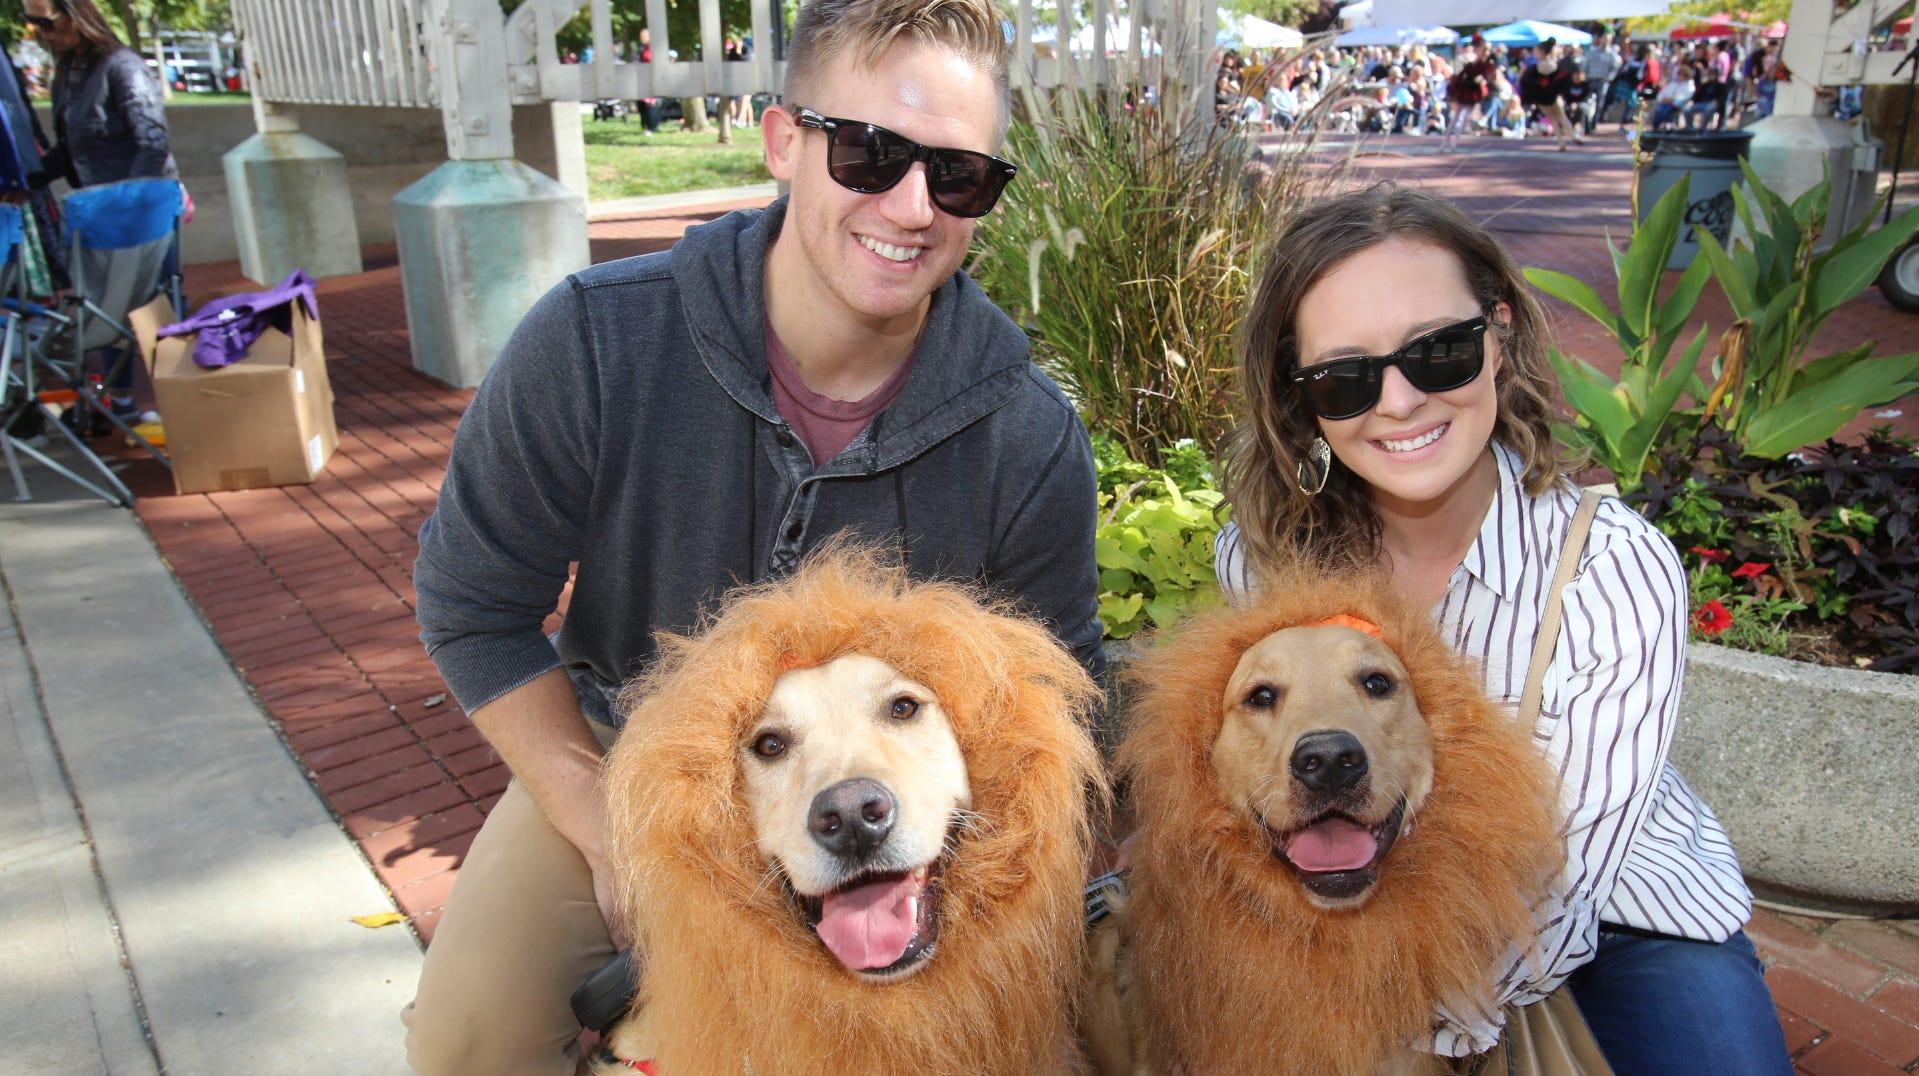 Chandler, Brooke, Brody, and Micah Dalenberg